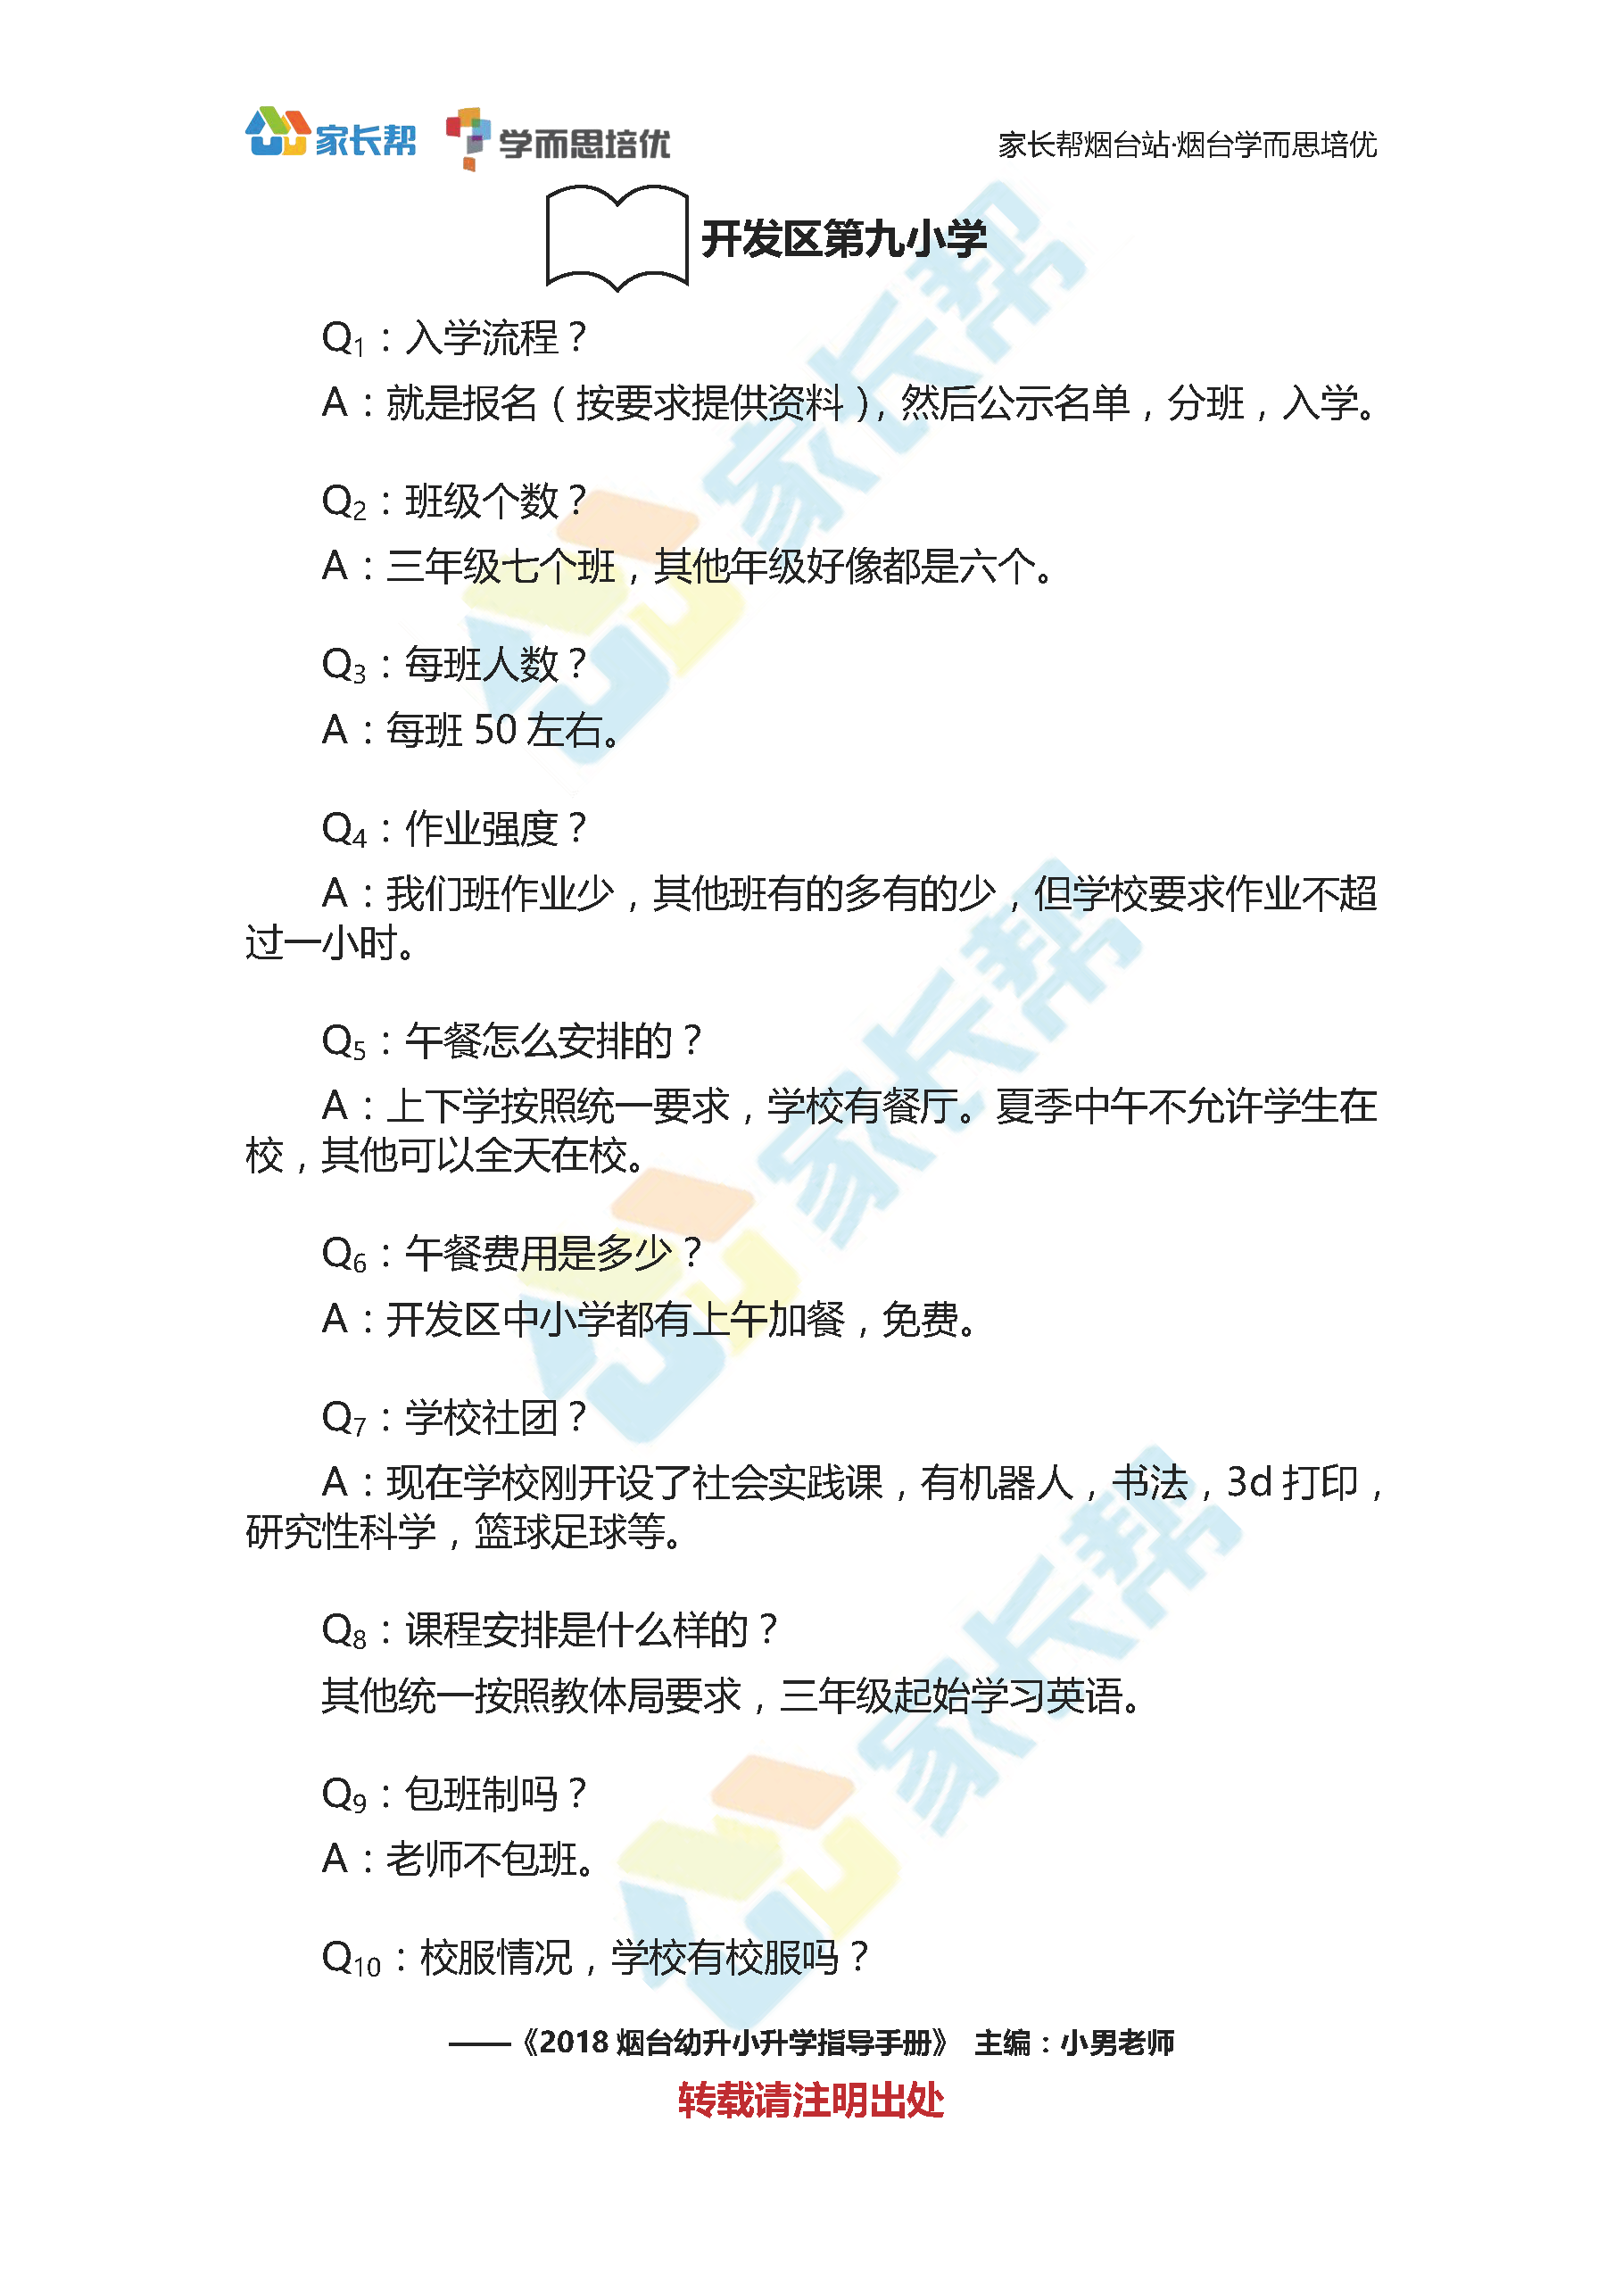 文档1_页面_1.png